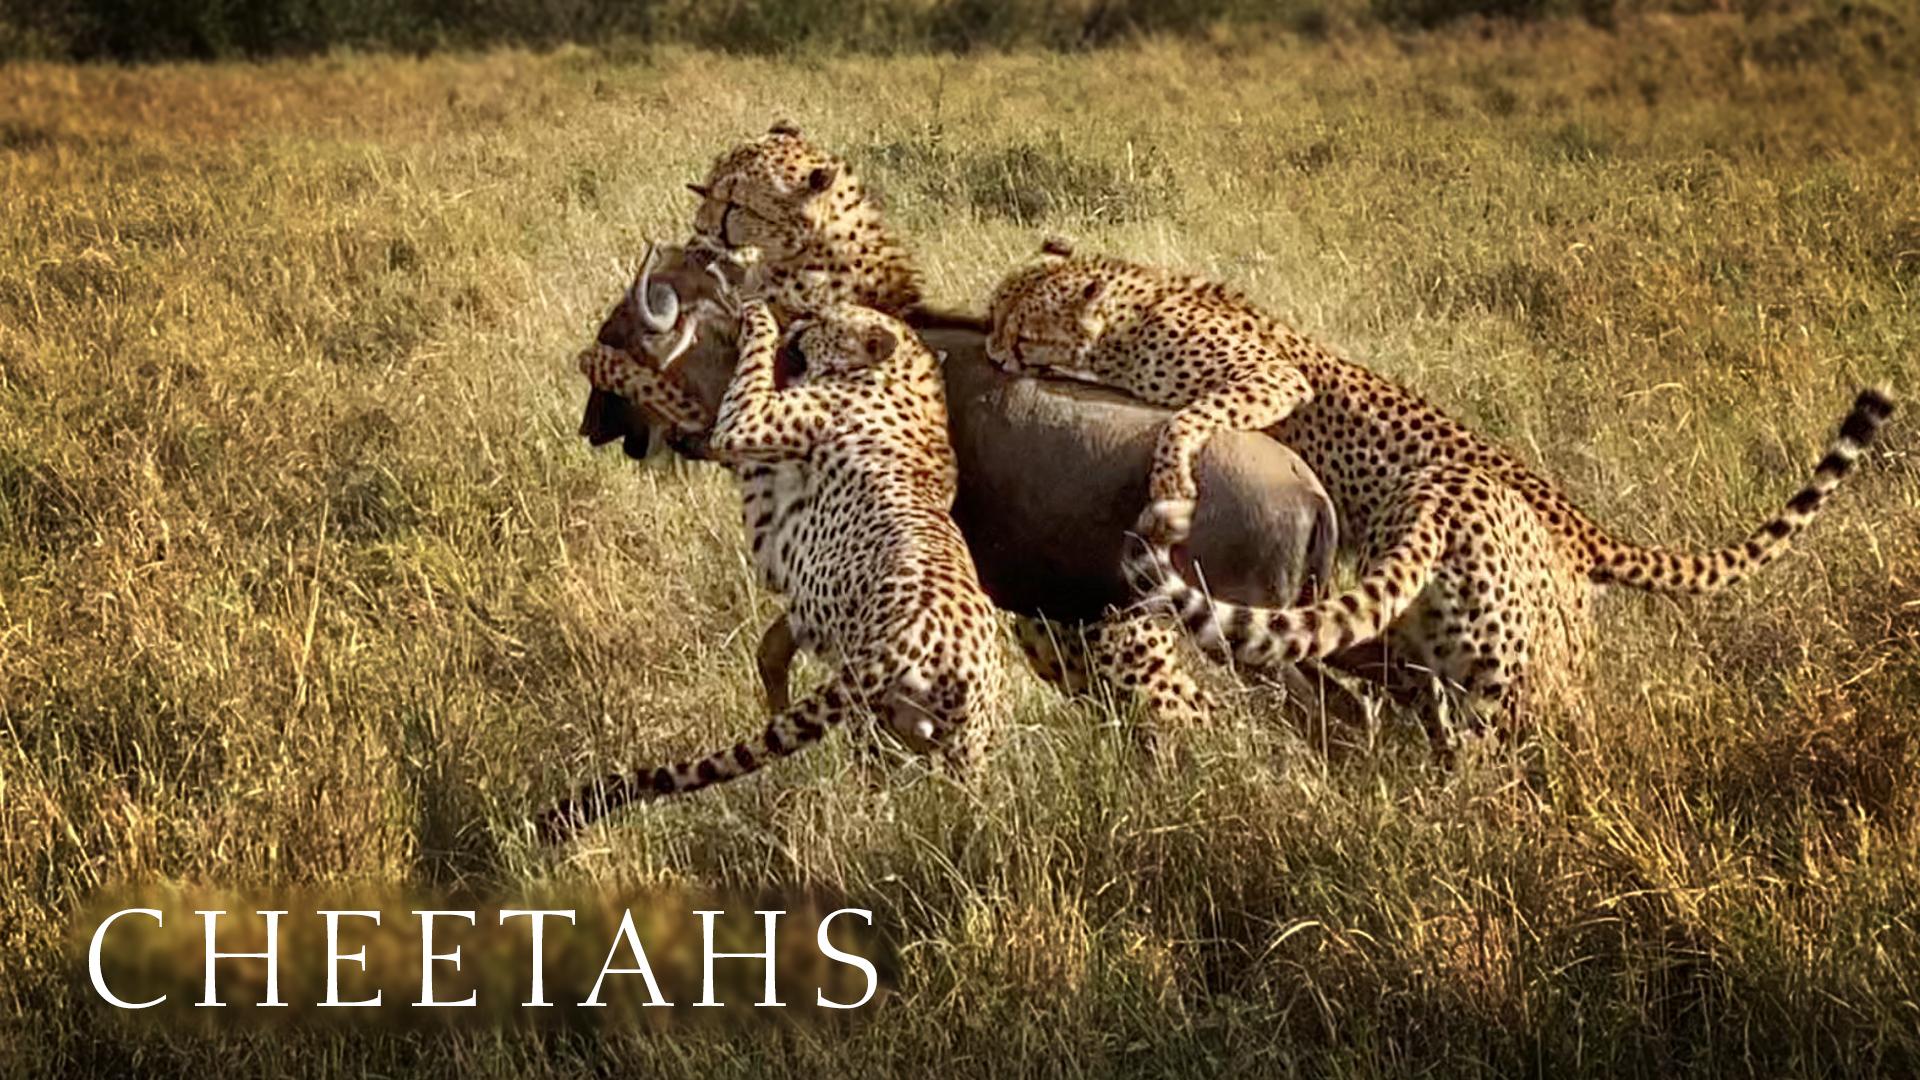 Coalition of five cheetahs bring down wildebeest.